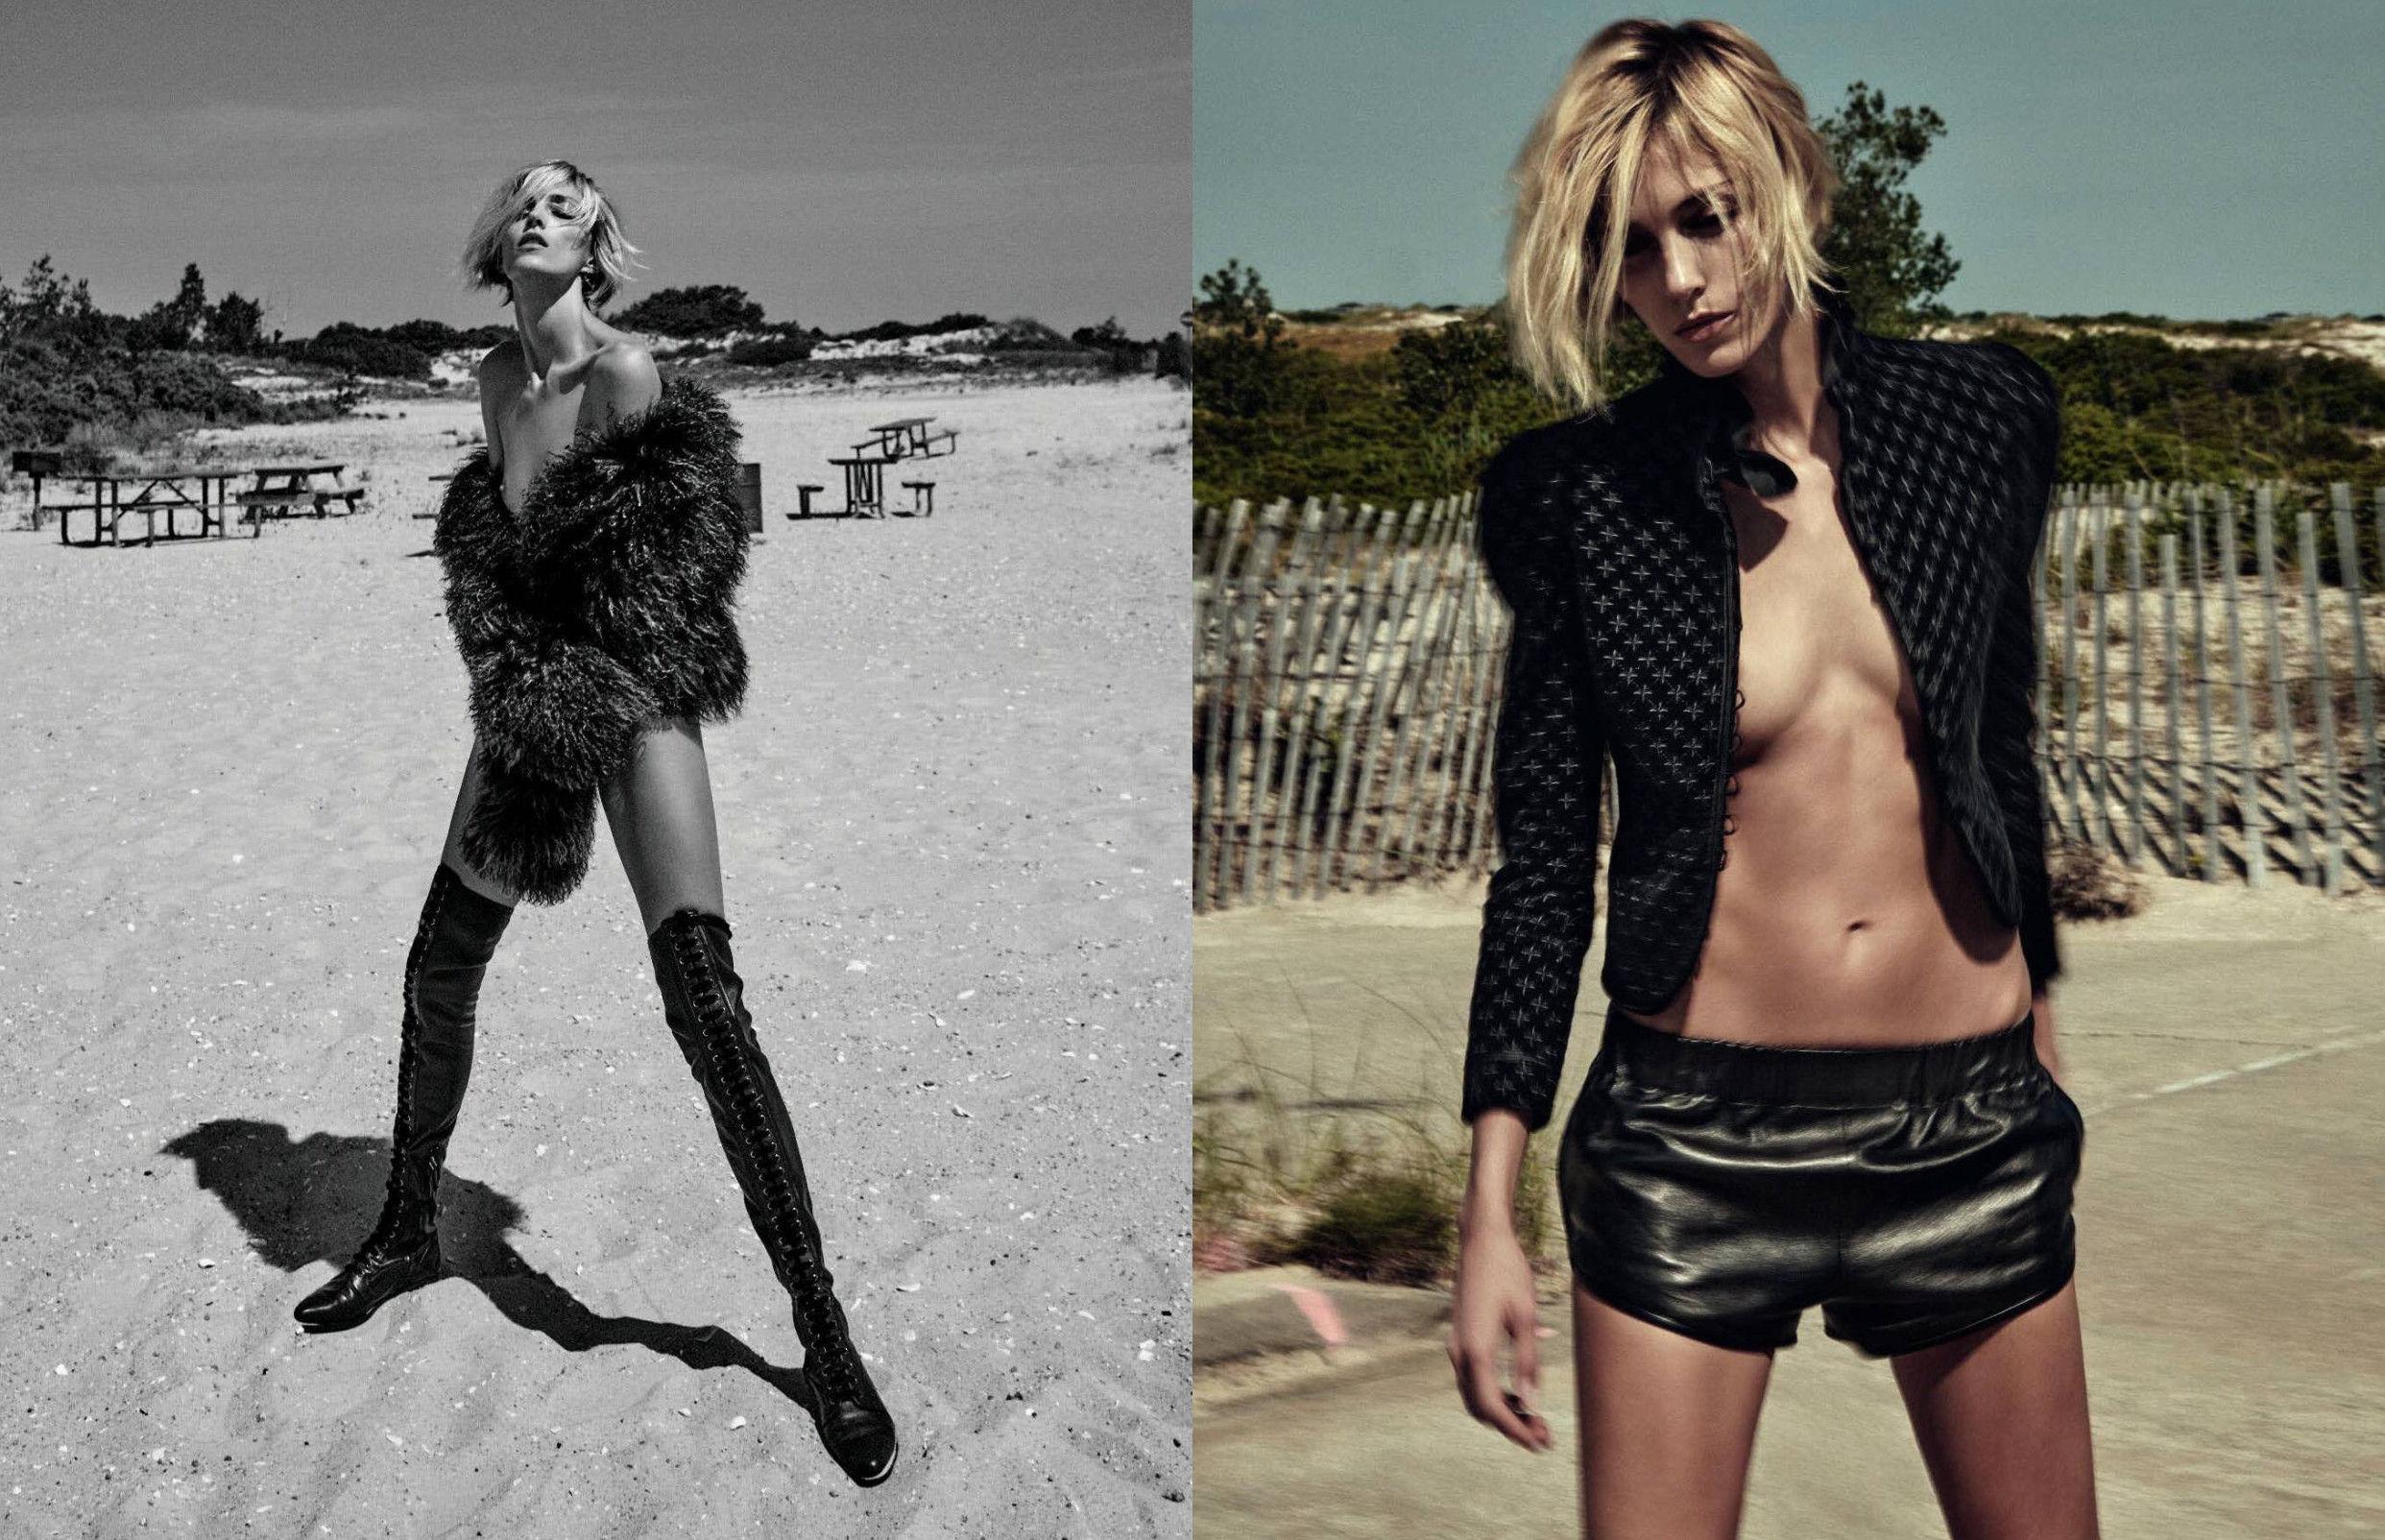 Anja Rubik Nude New Photo Gallery